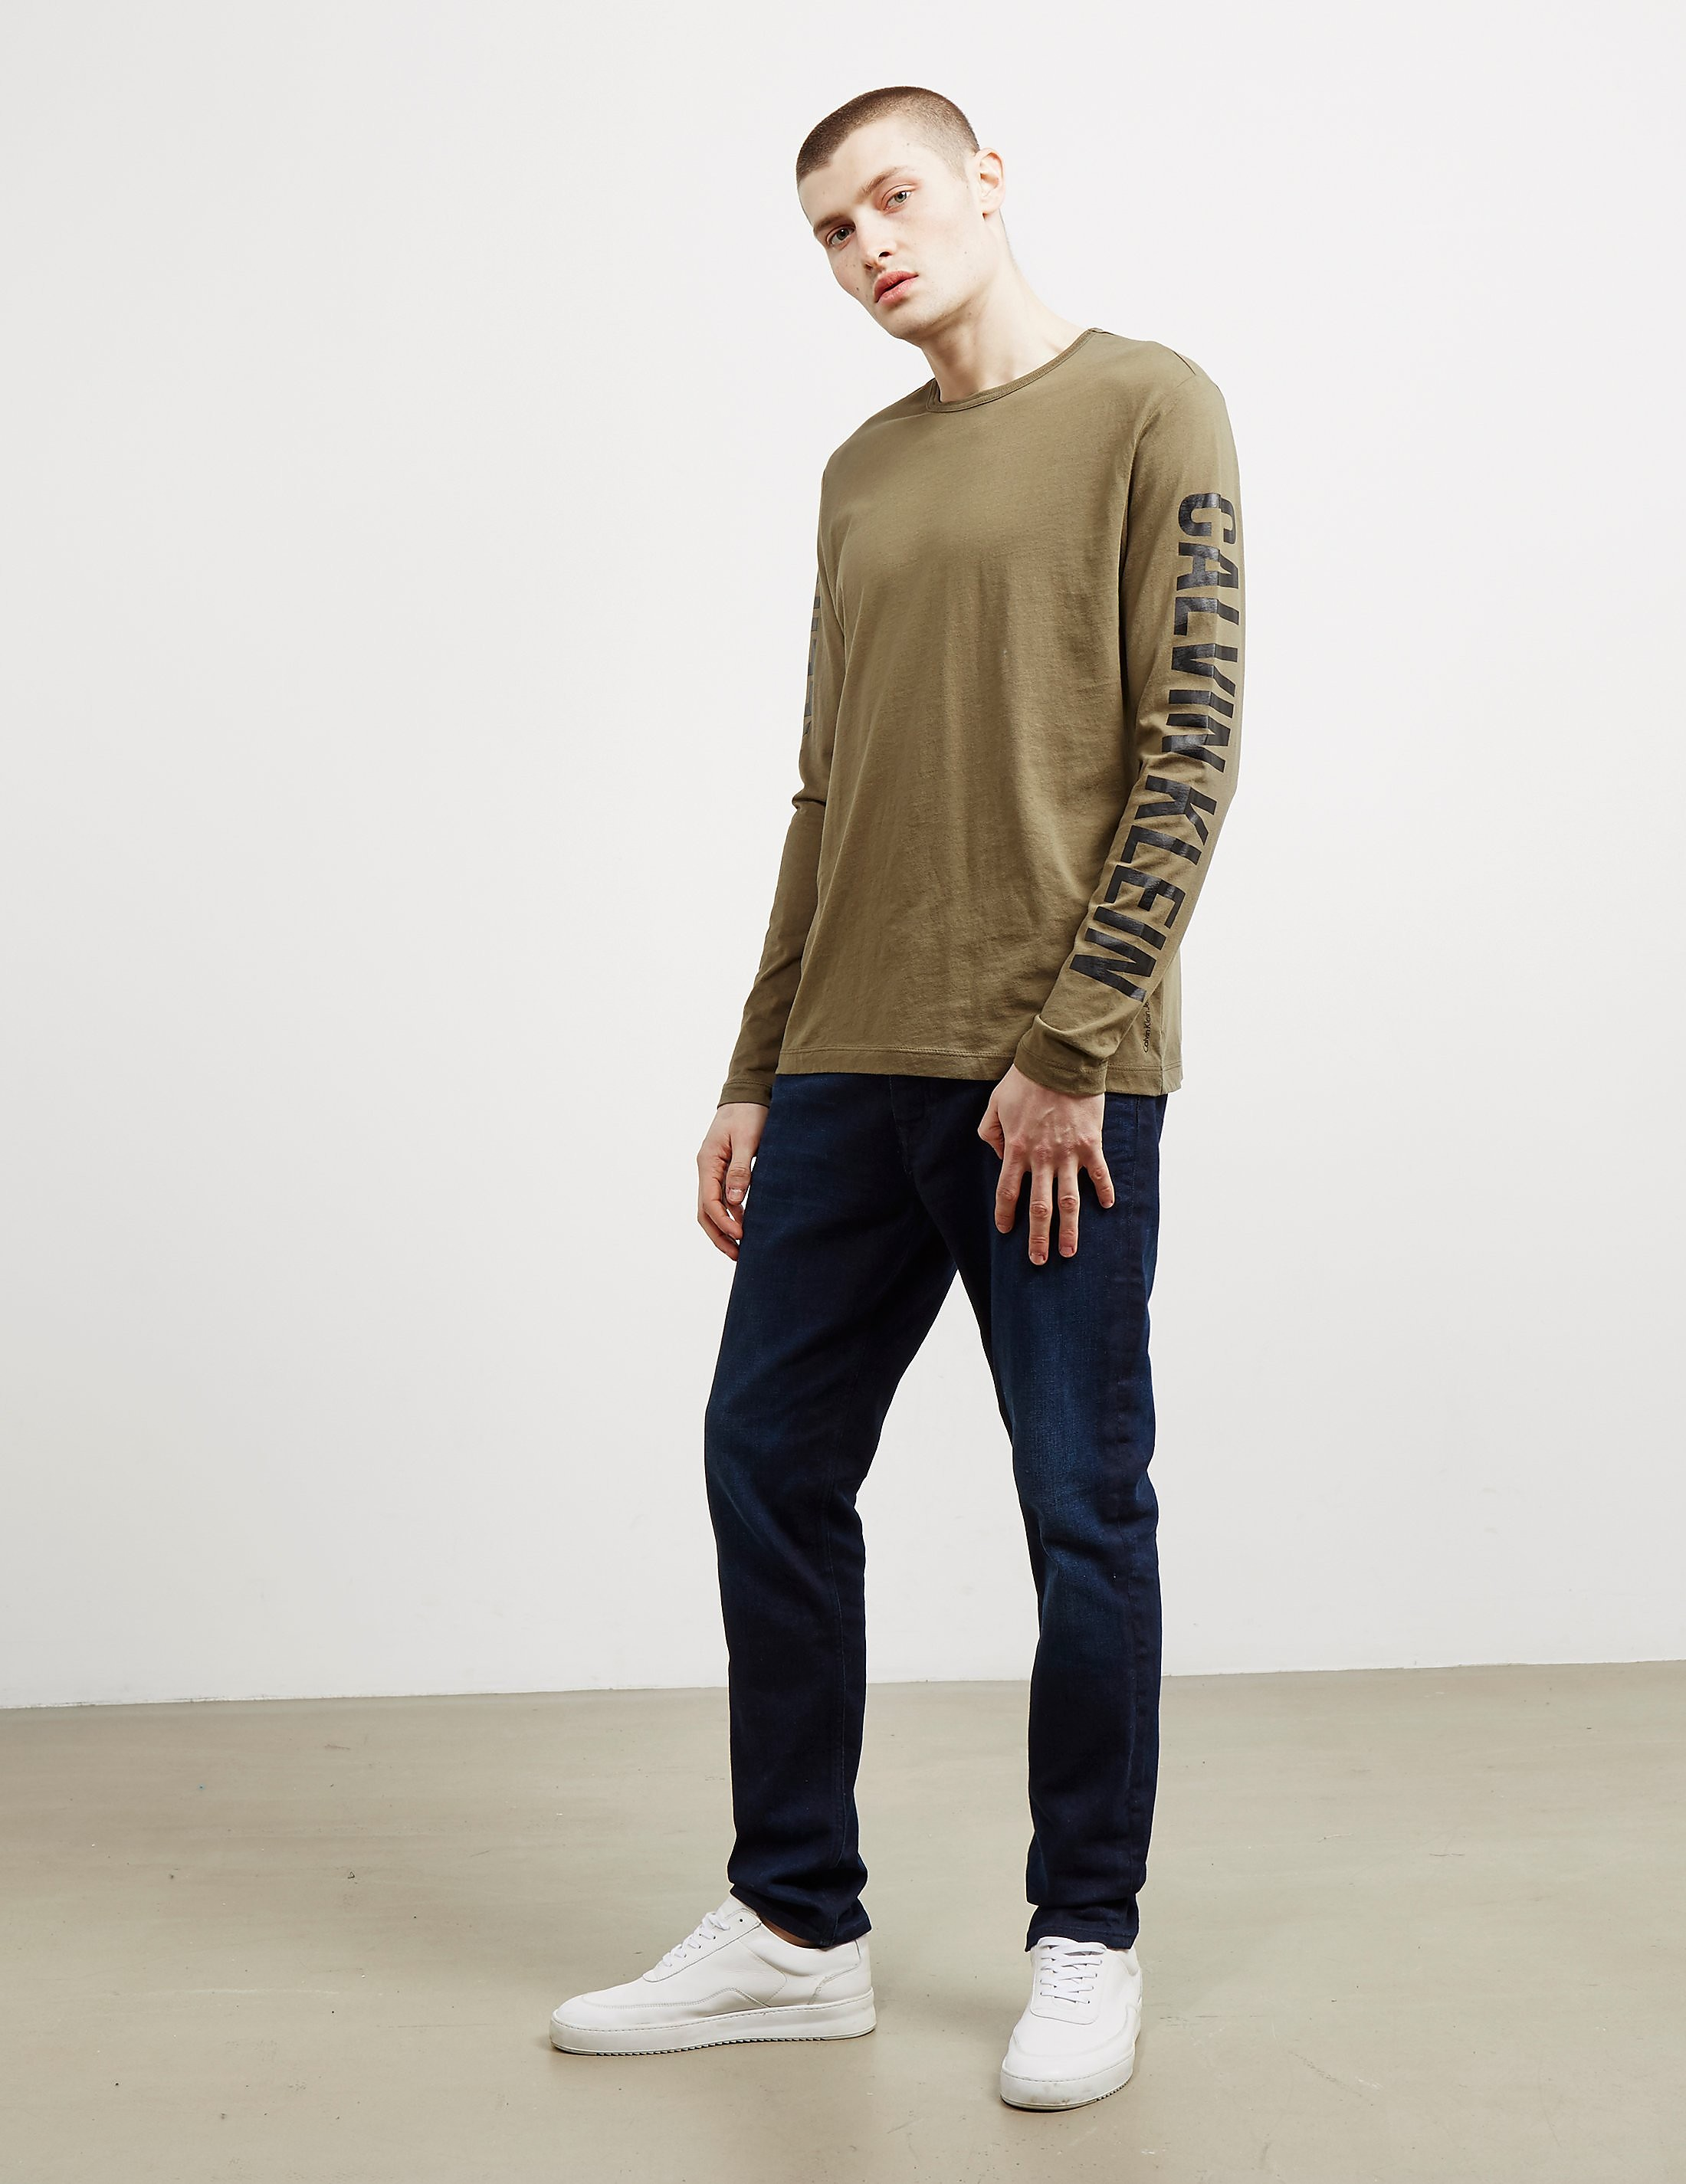 Calvin Klein Arm Logo Long Sleeve T-Shirt